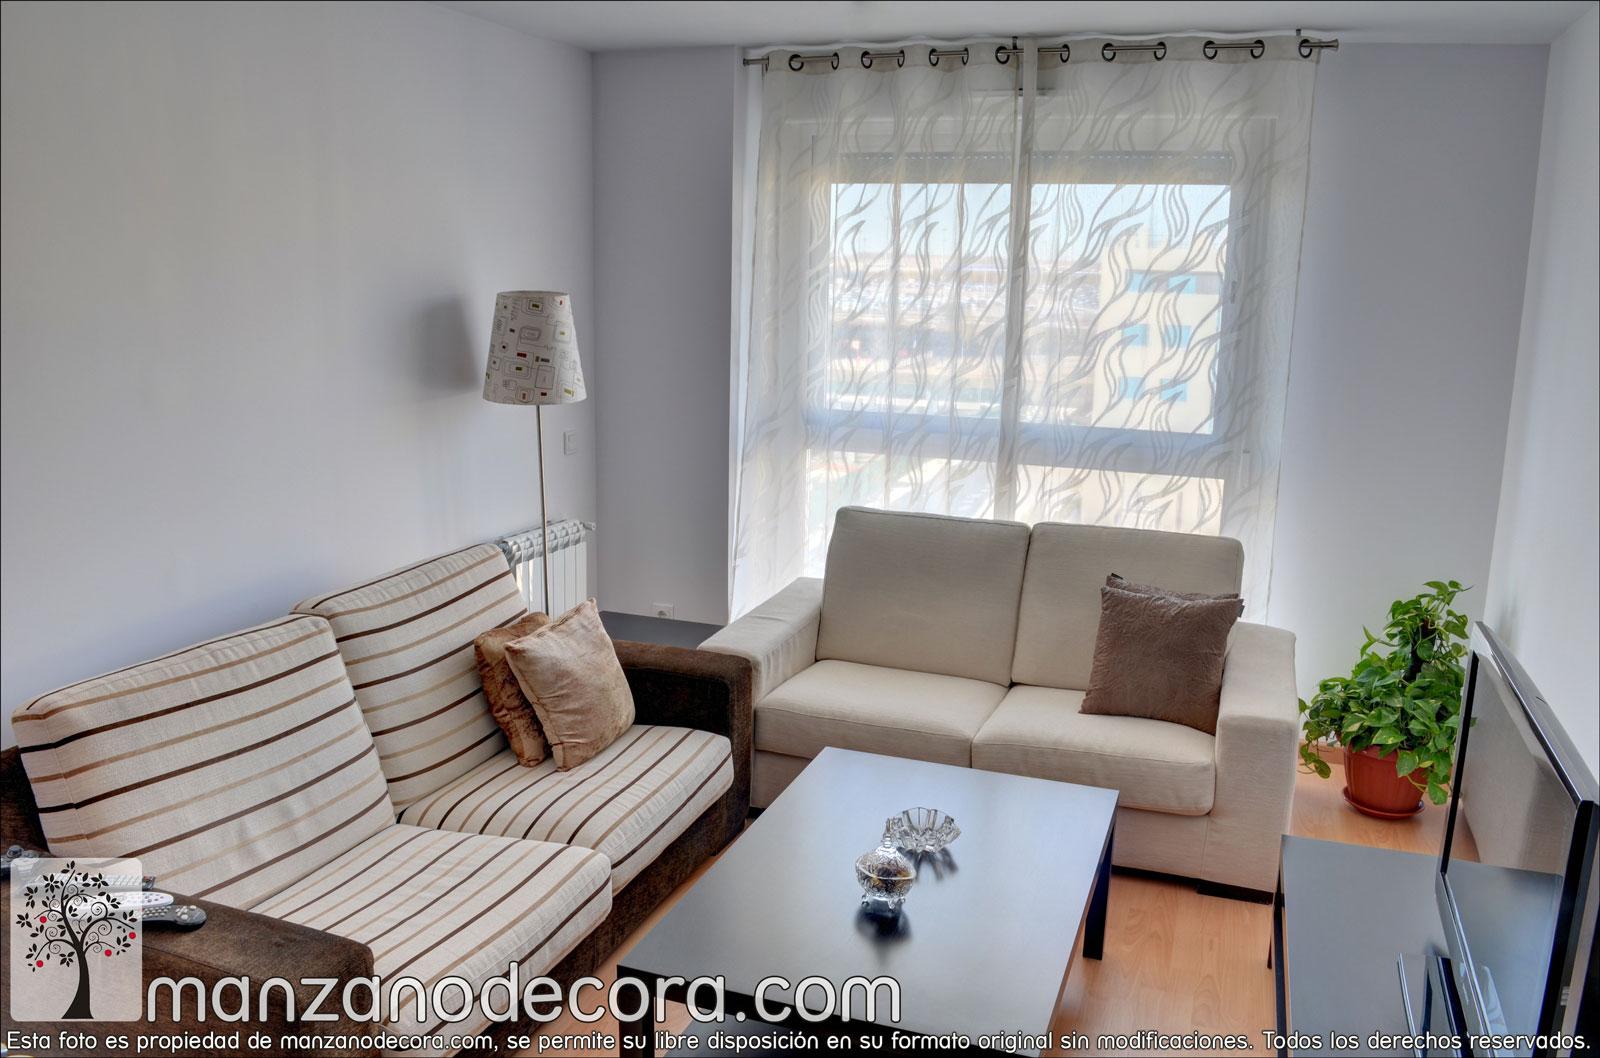 Cortinas cortinas manzanodecora for Cortinas cortas salon